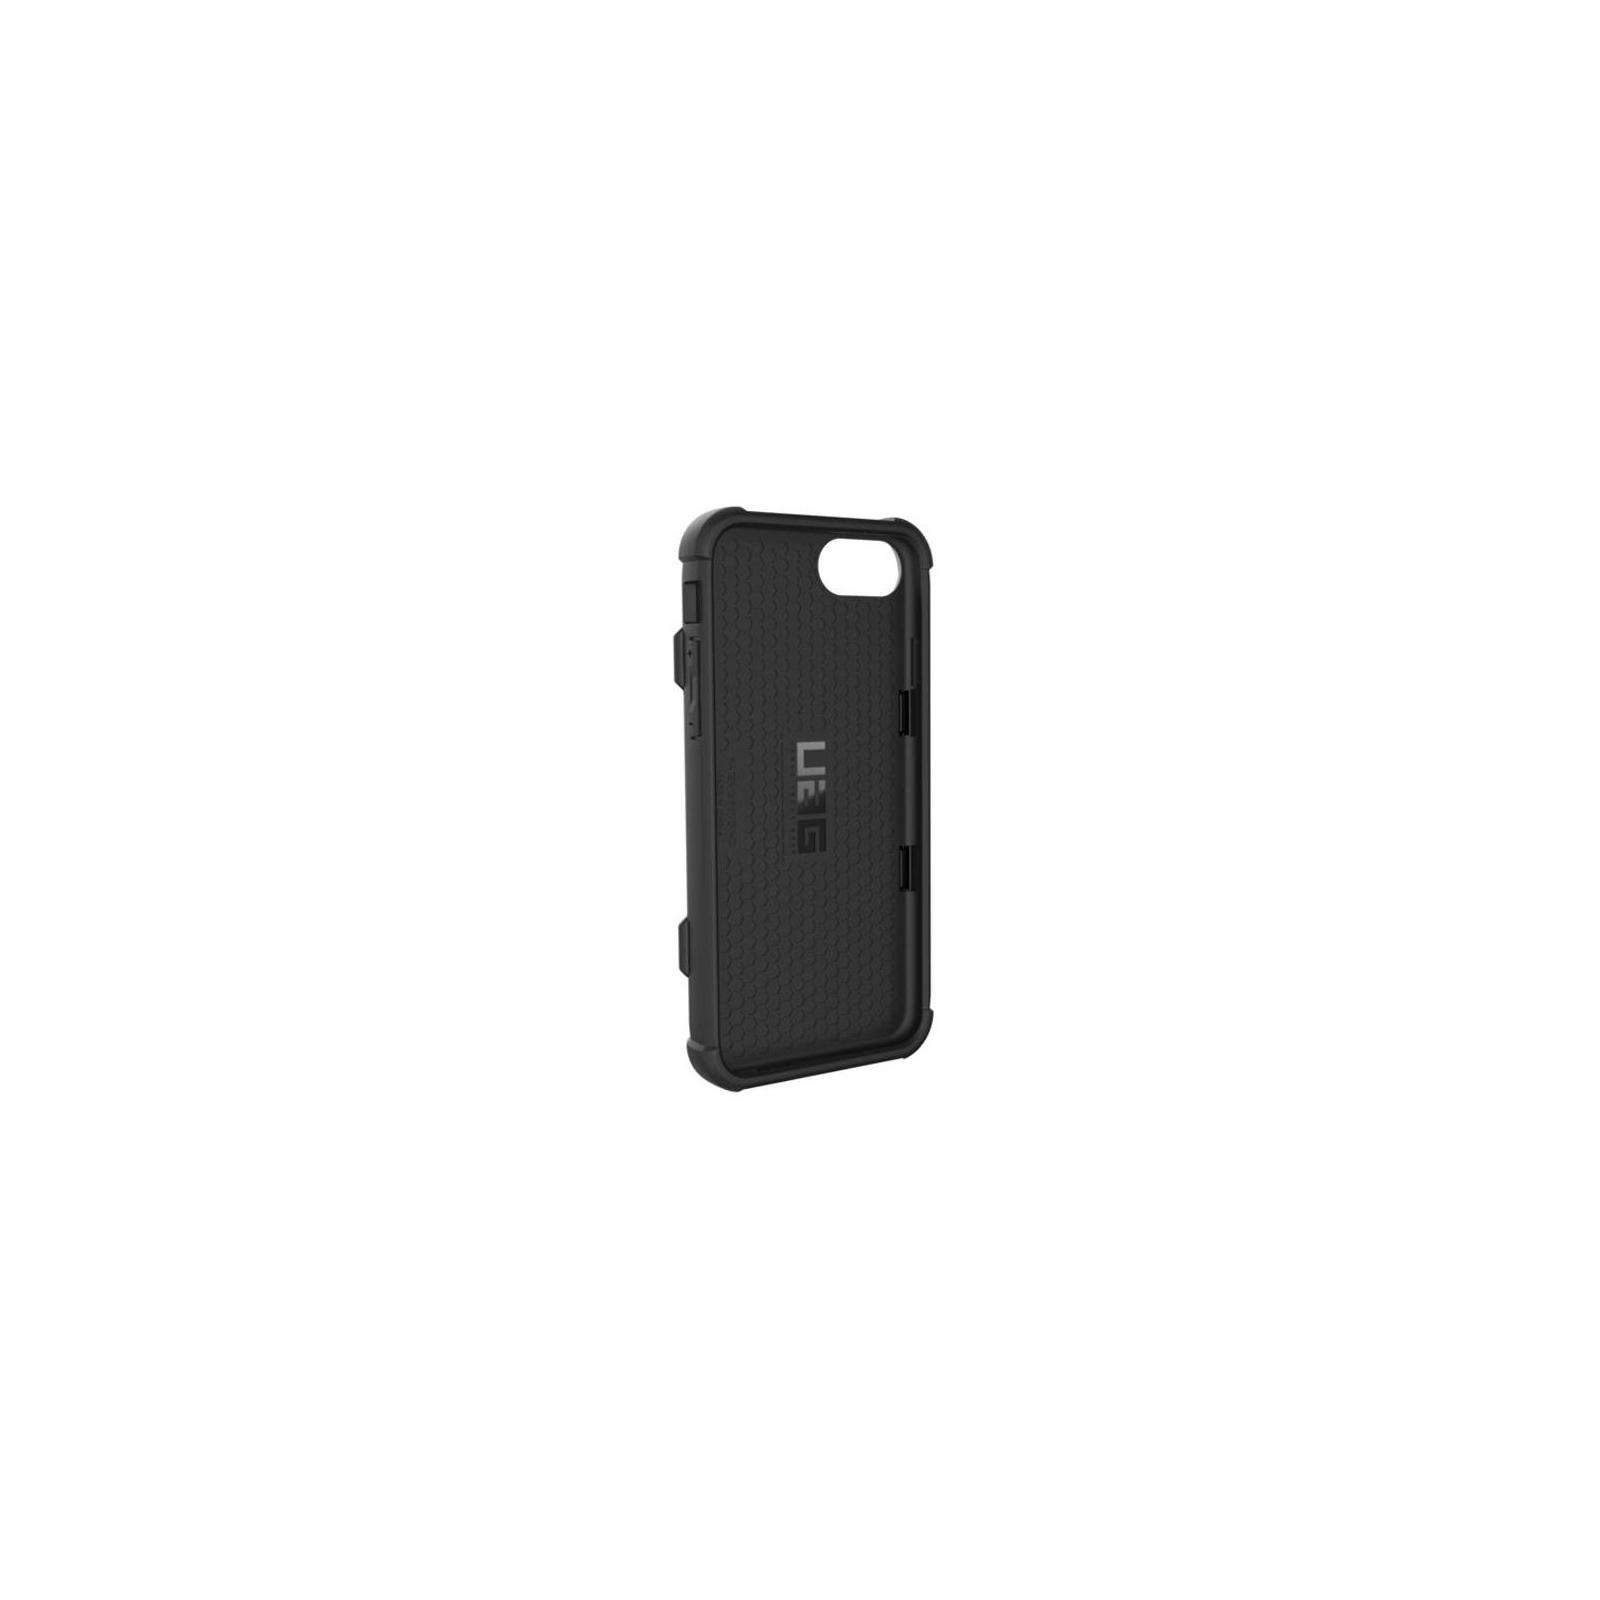 Чехол для моб. телефона Uag iPhone 8/7/6S/6 Trooper Case Black (IPH7/6S-T-BK) изображение 4